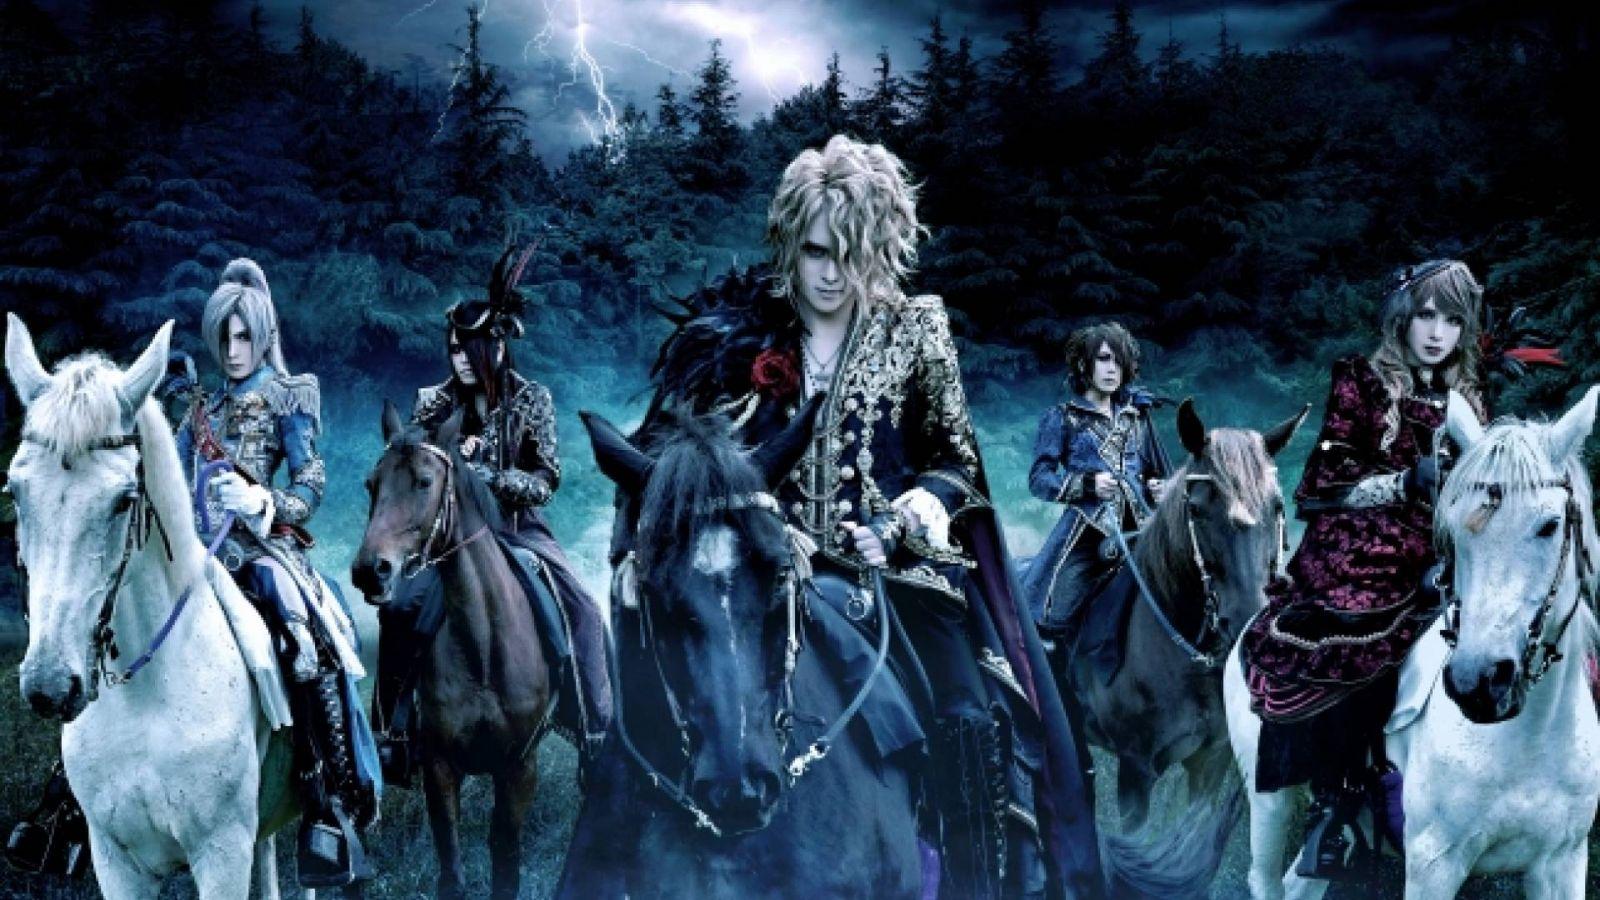 Versailles lançará álbum exclusivo © Versailles. All rights reserved.